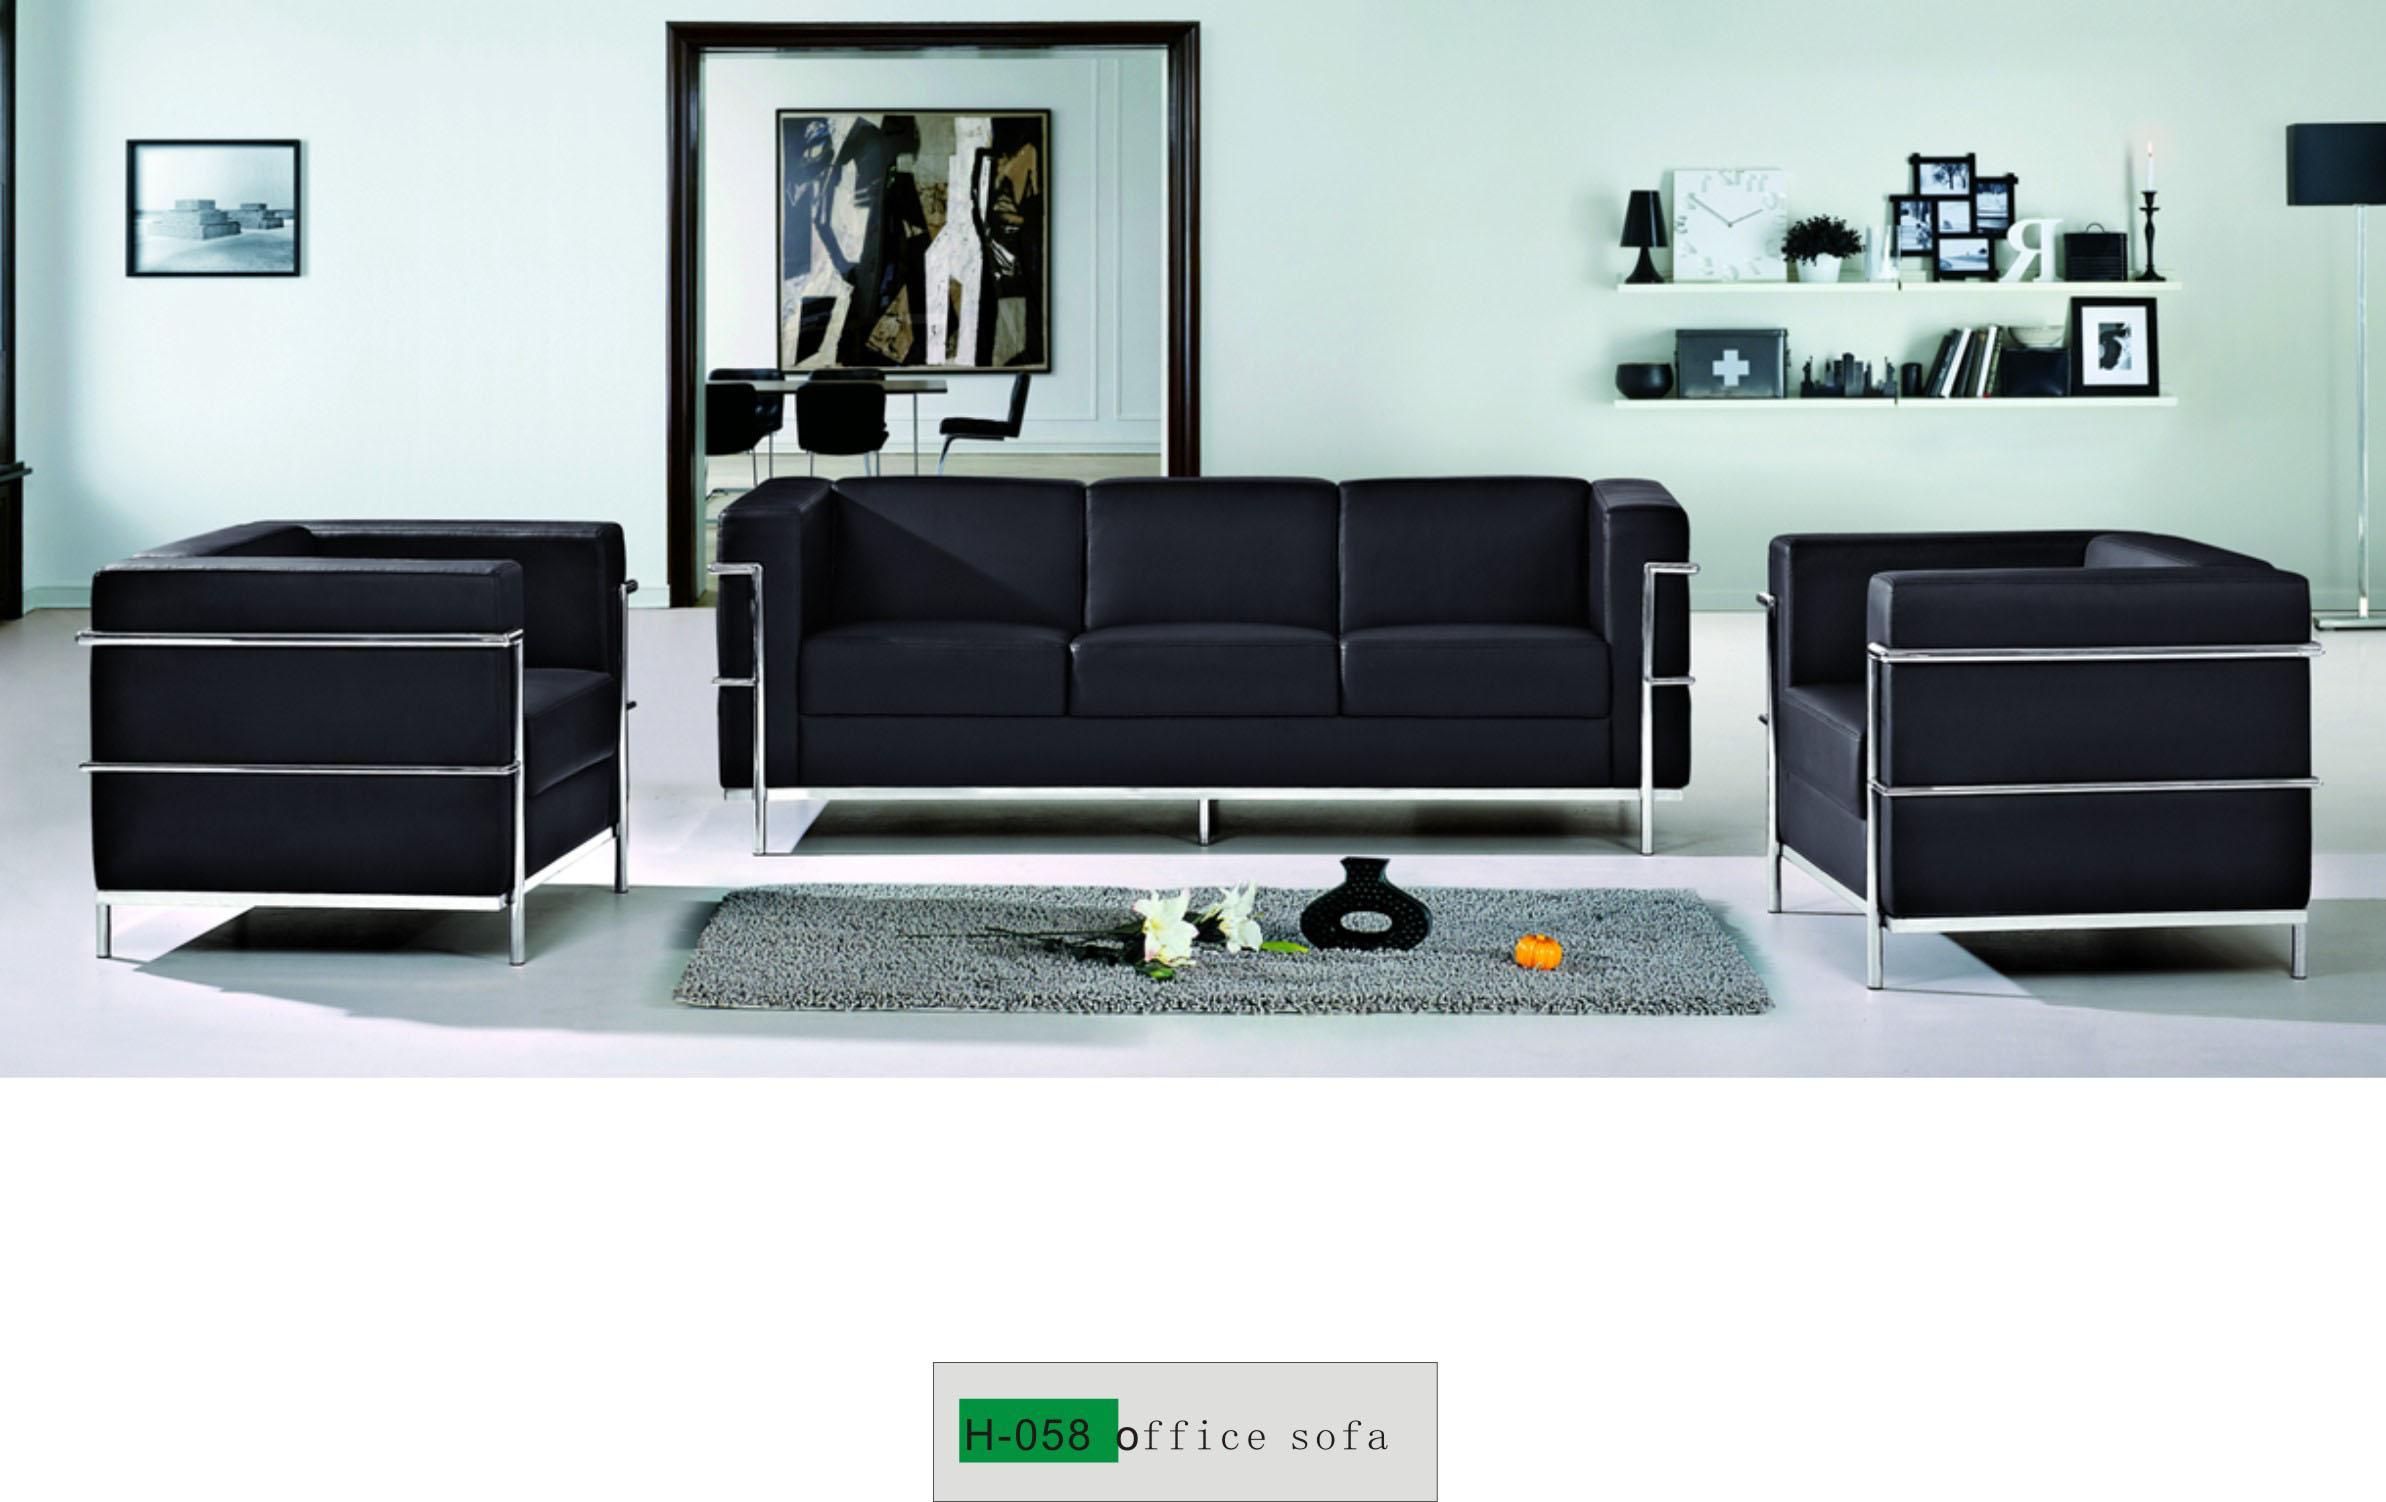 modern office reception sofa H-058 - Buy durable office sofa ...